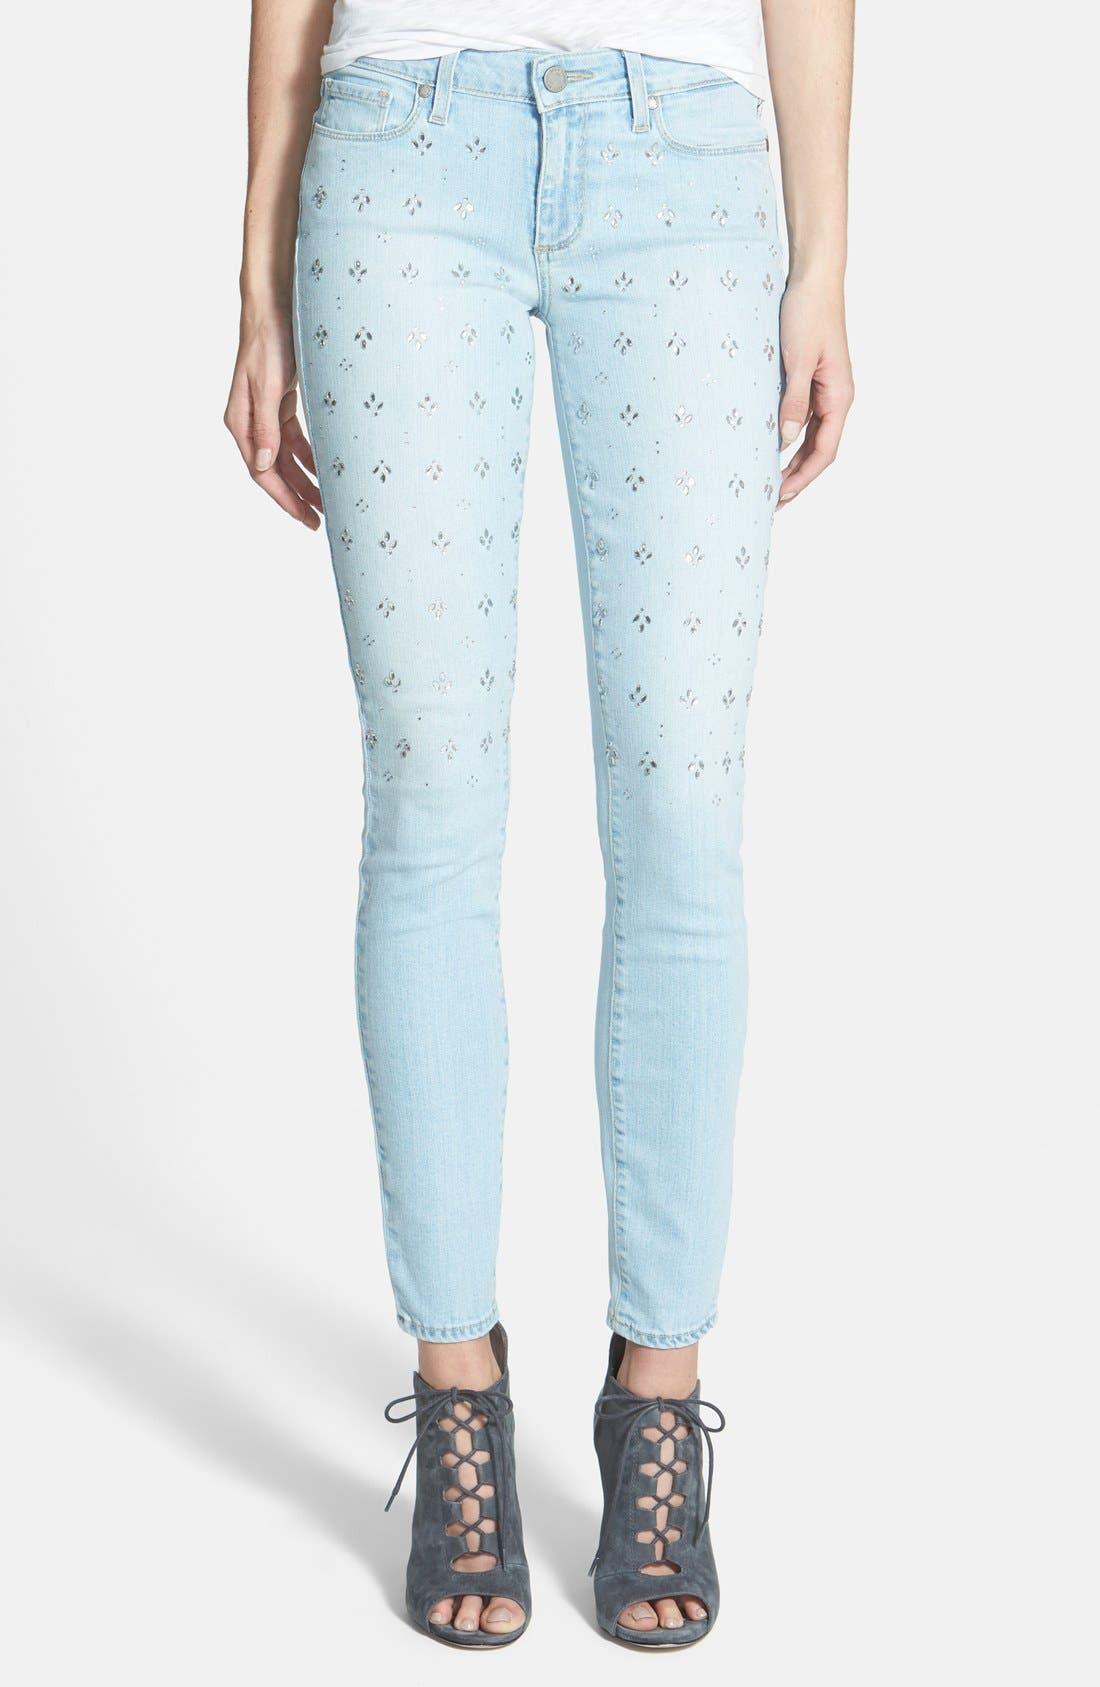 Main Image - Paige Denim 'Verdugo' Ultra Skinny Jeans (Naomi Embellished)